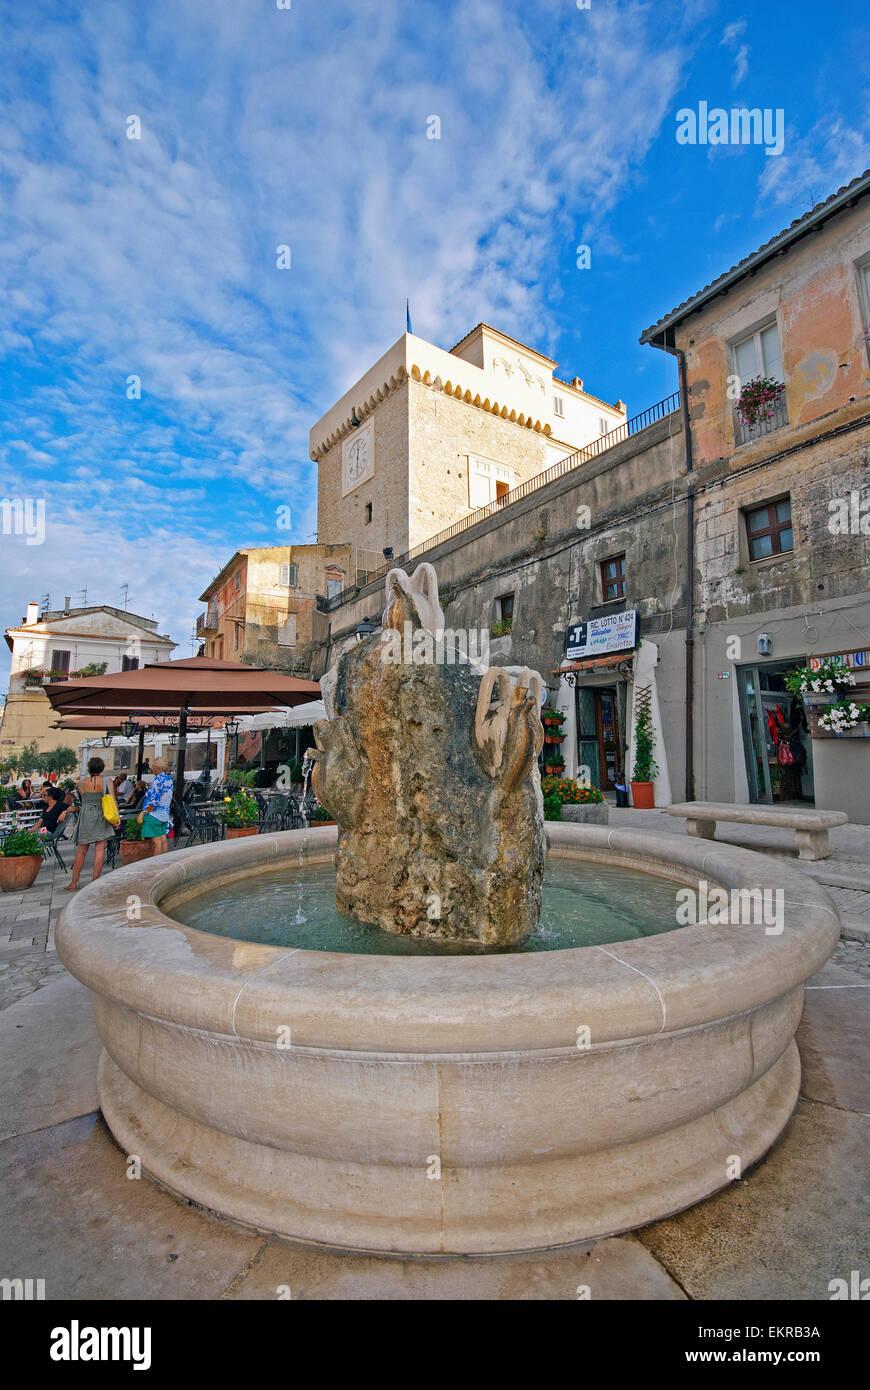 San Felice Circeo, fountain in piazza Vittorio Veneto and Tower of Templar Knights, old town centre, Lazio, Italy - Stock Image